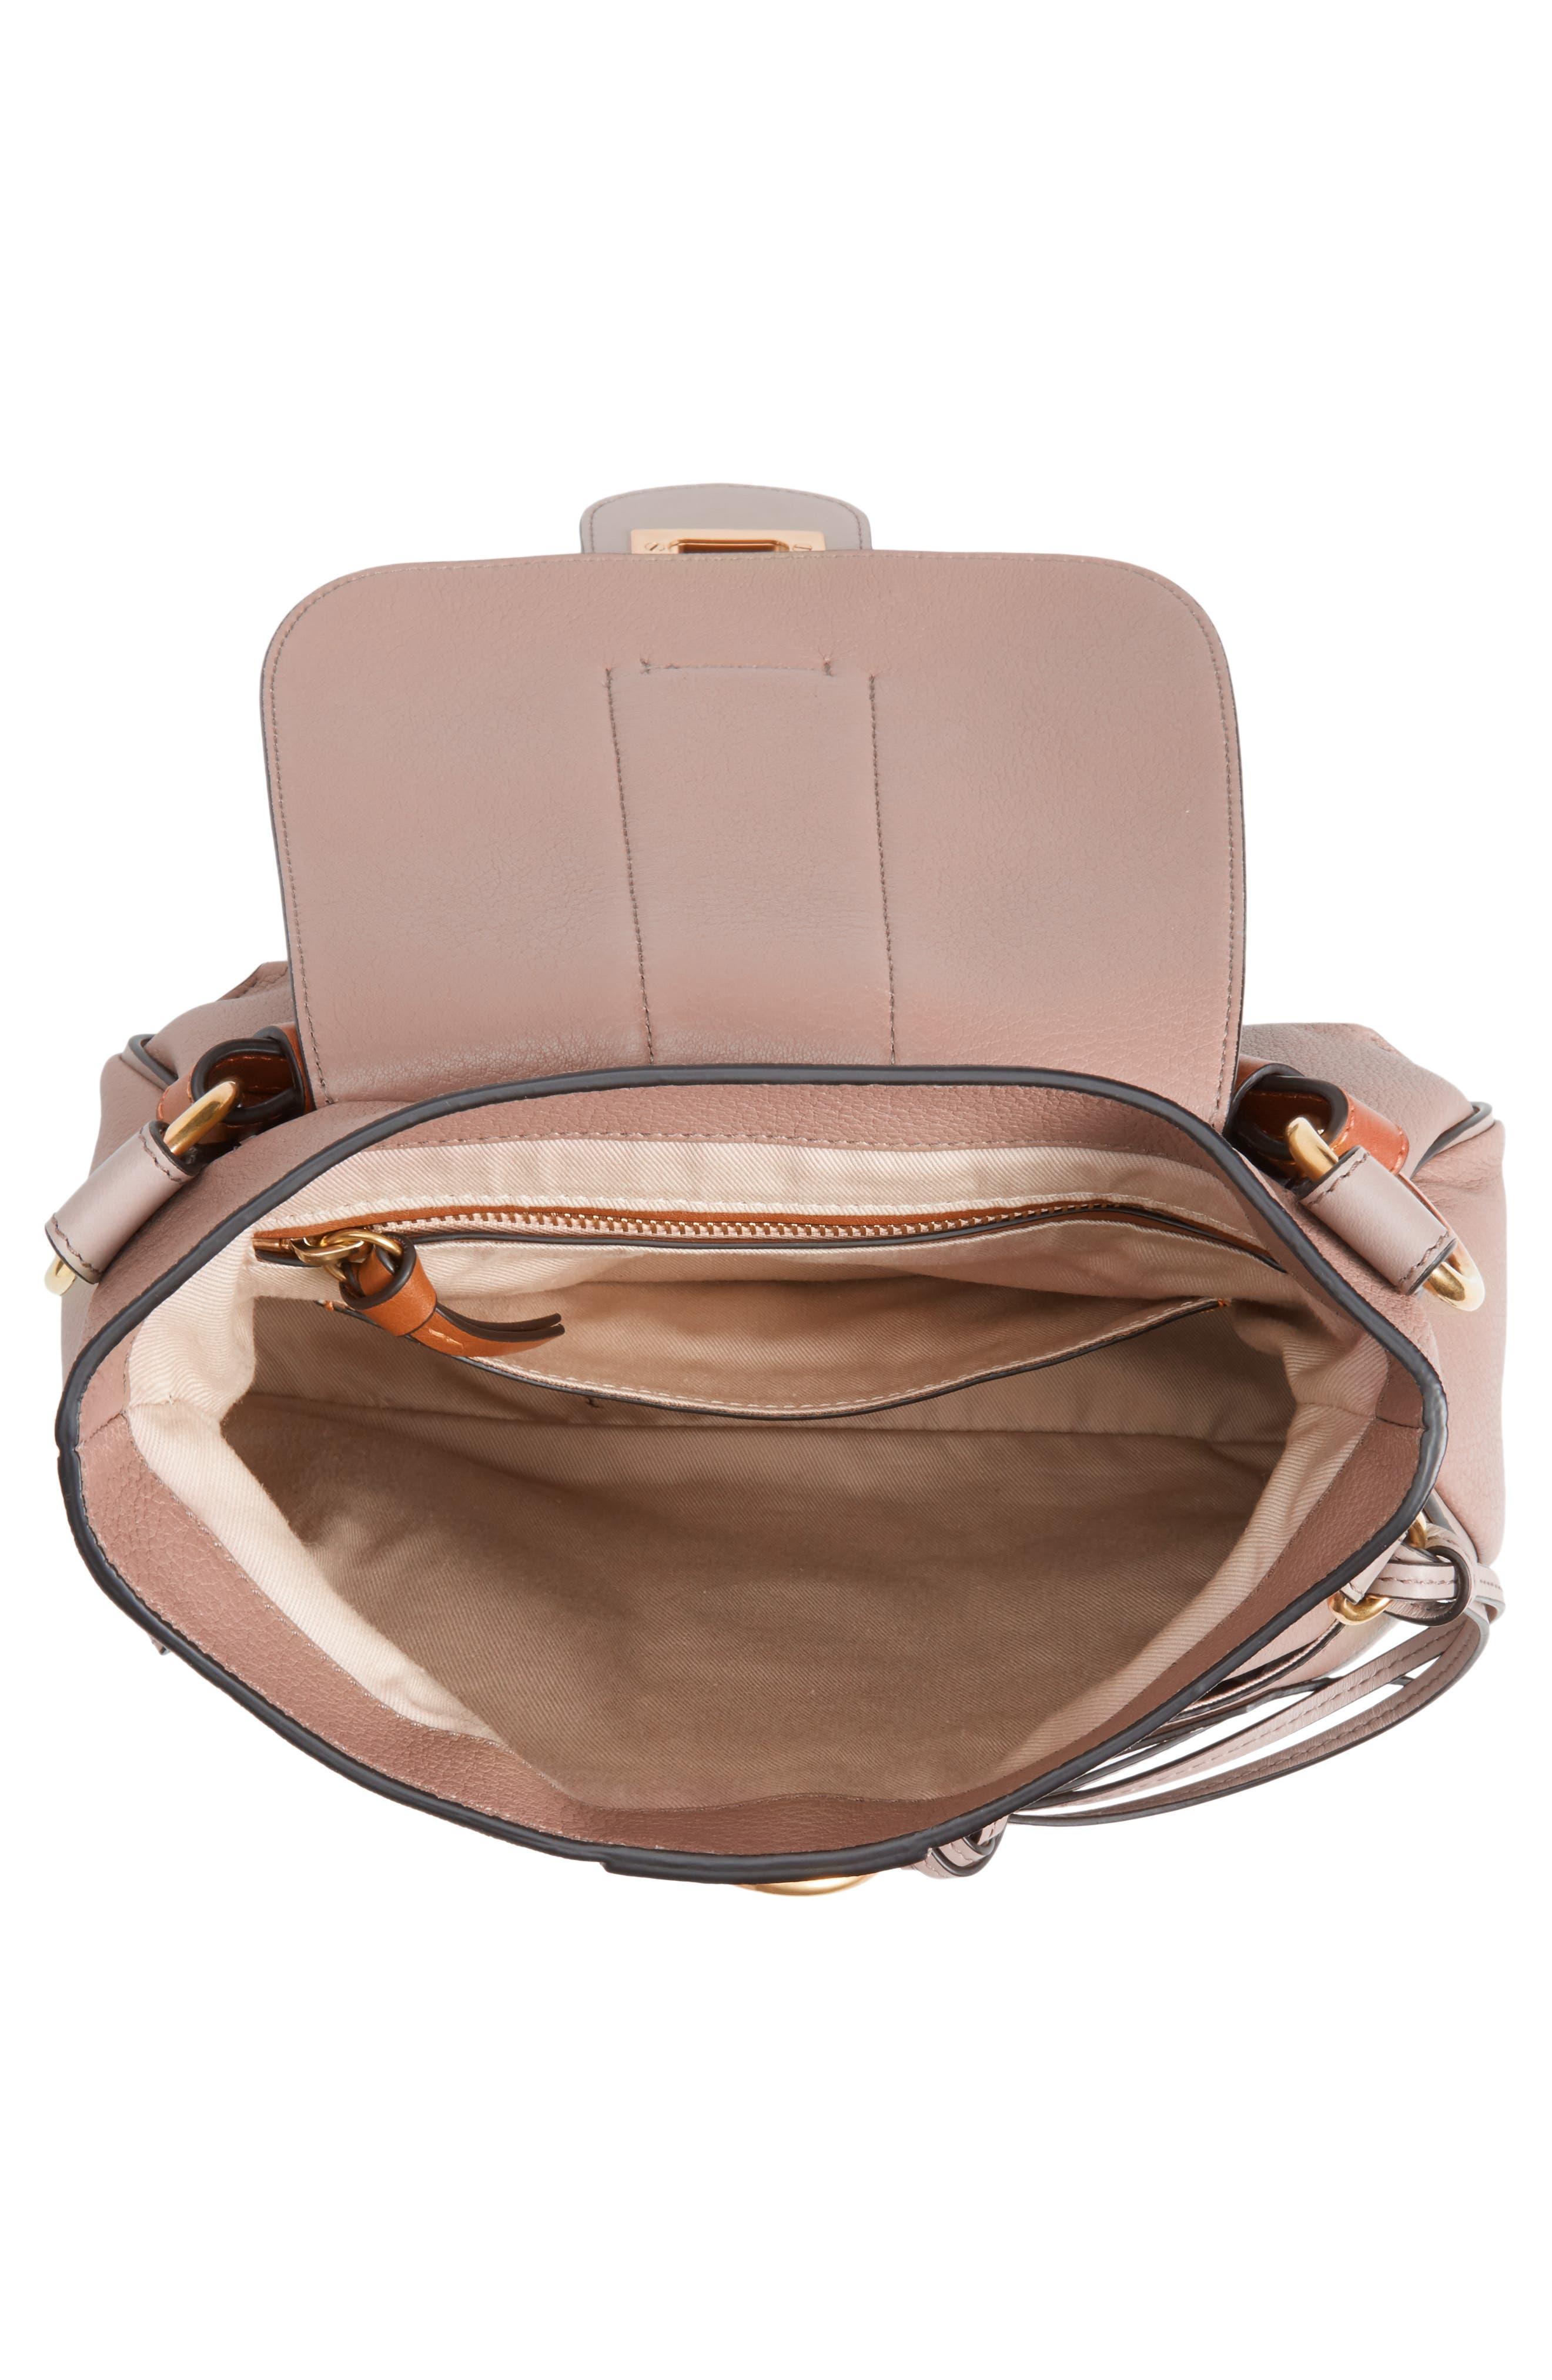 CHLOÉ,                             Small Lexa Leather Shoulder Bag,                             Alternate thumbnail 4, color,                             031